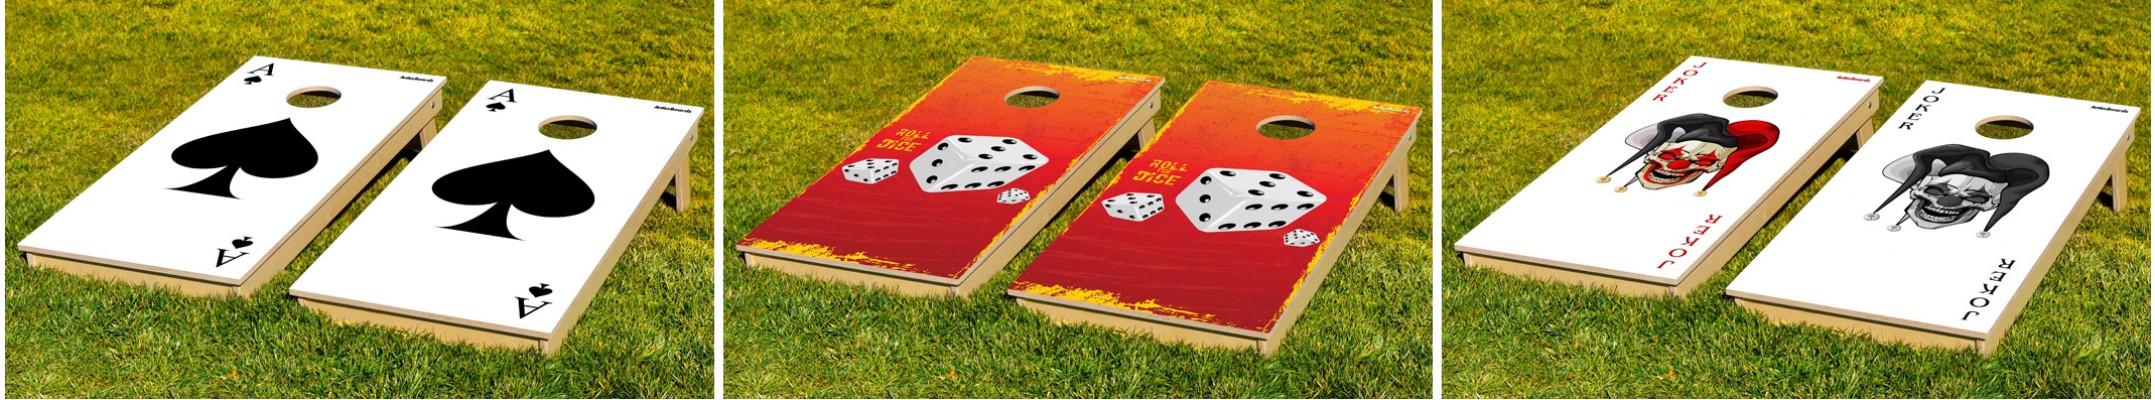 The Gambling & Poker Boards